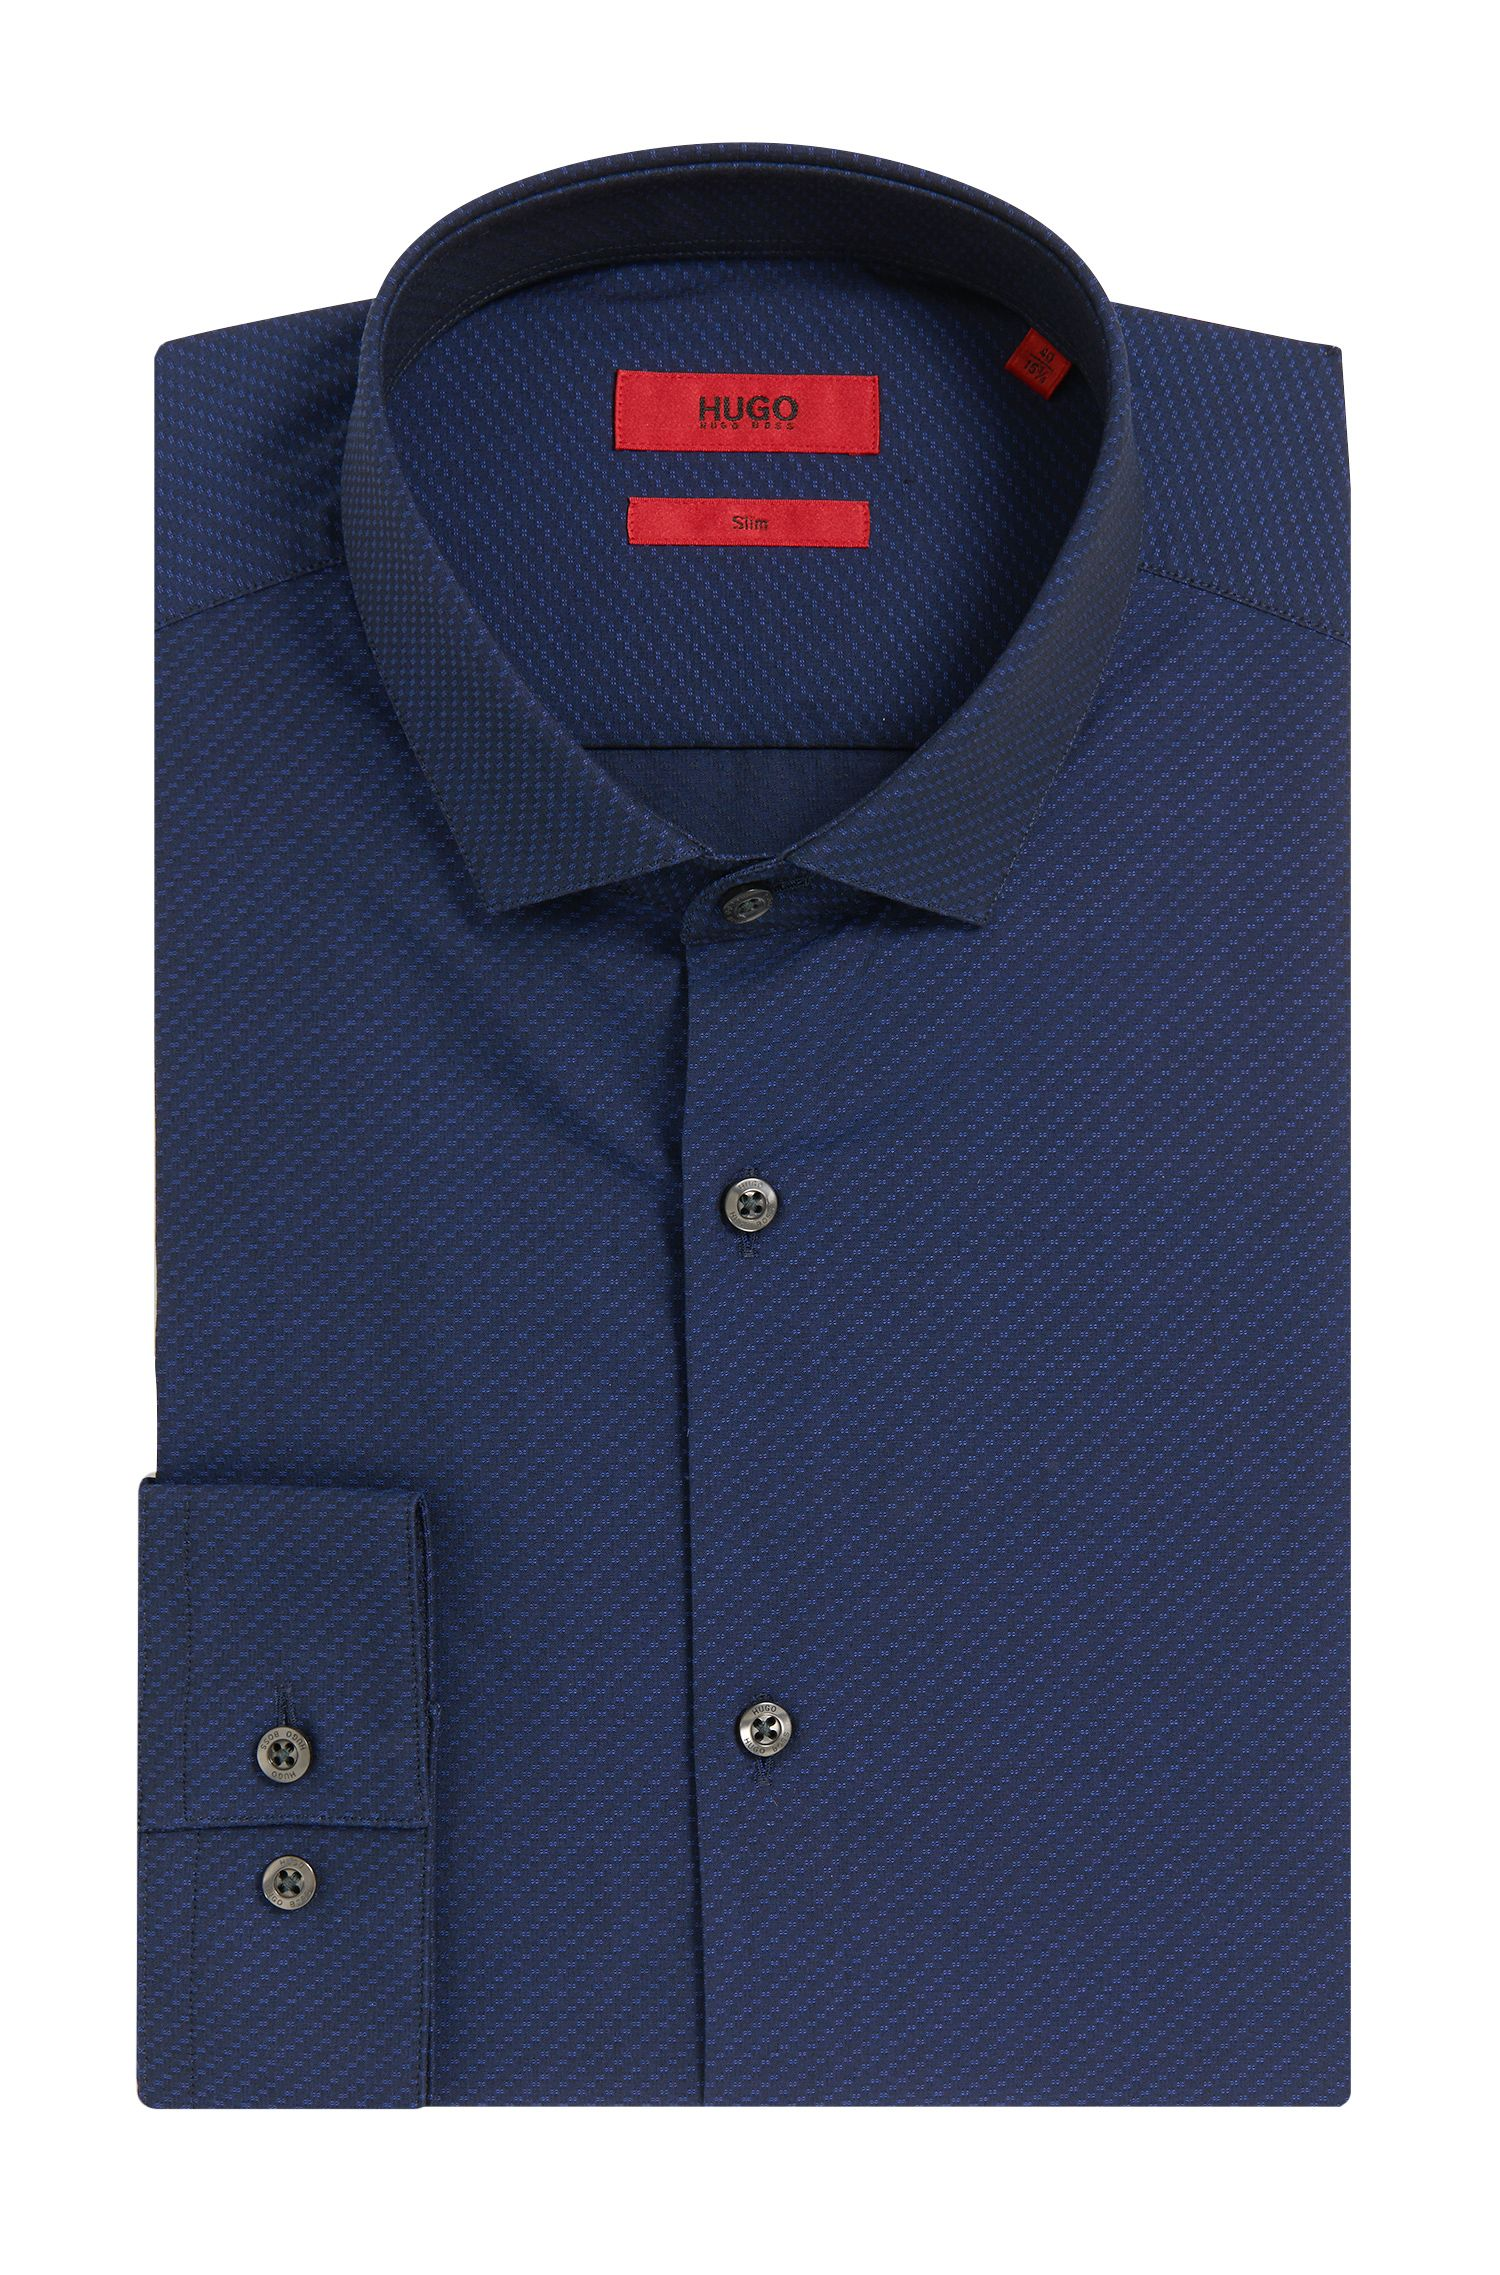 'Erondo' | Slim Fit, Cotton Patterned Dress Shirt